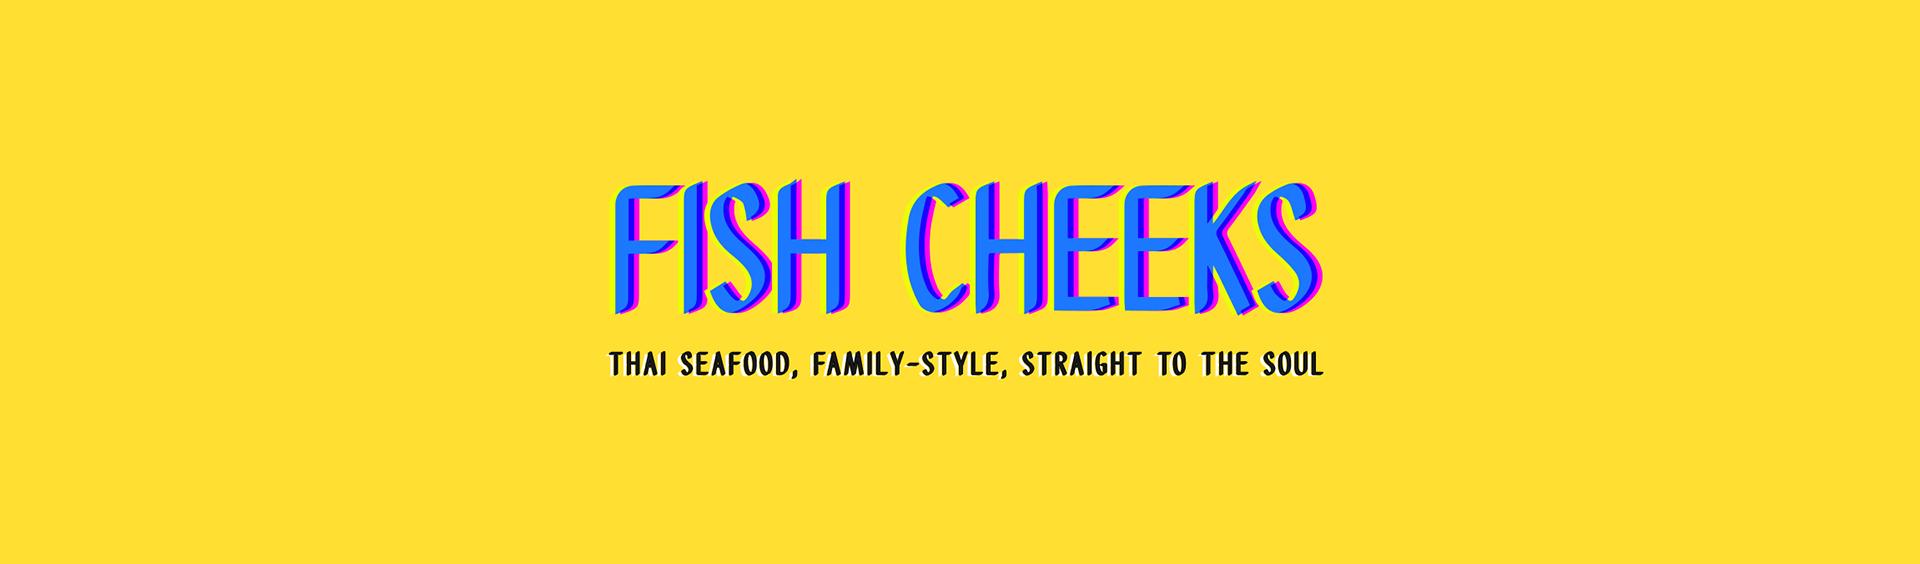 fish_cheeks_LOGO_YELLOW_SQUARE